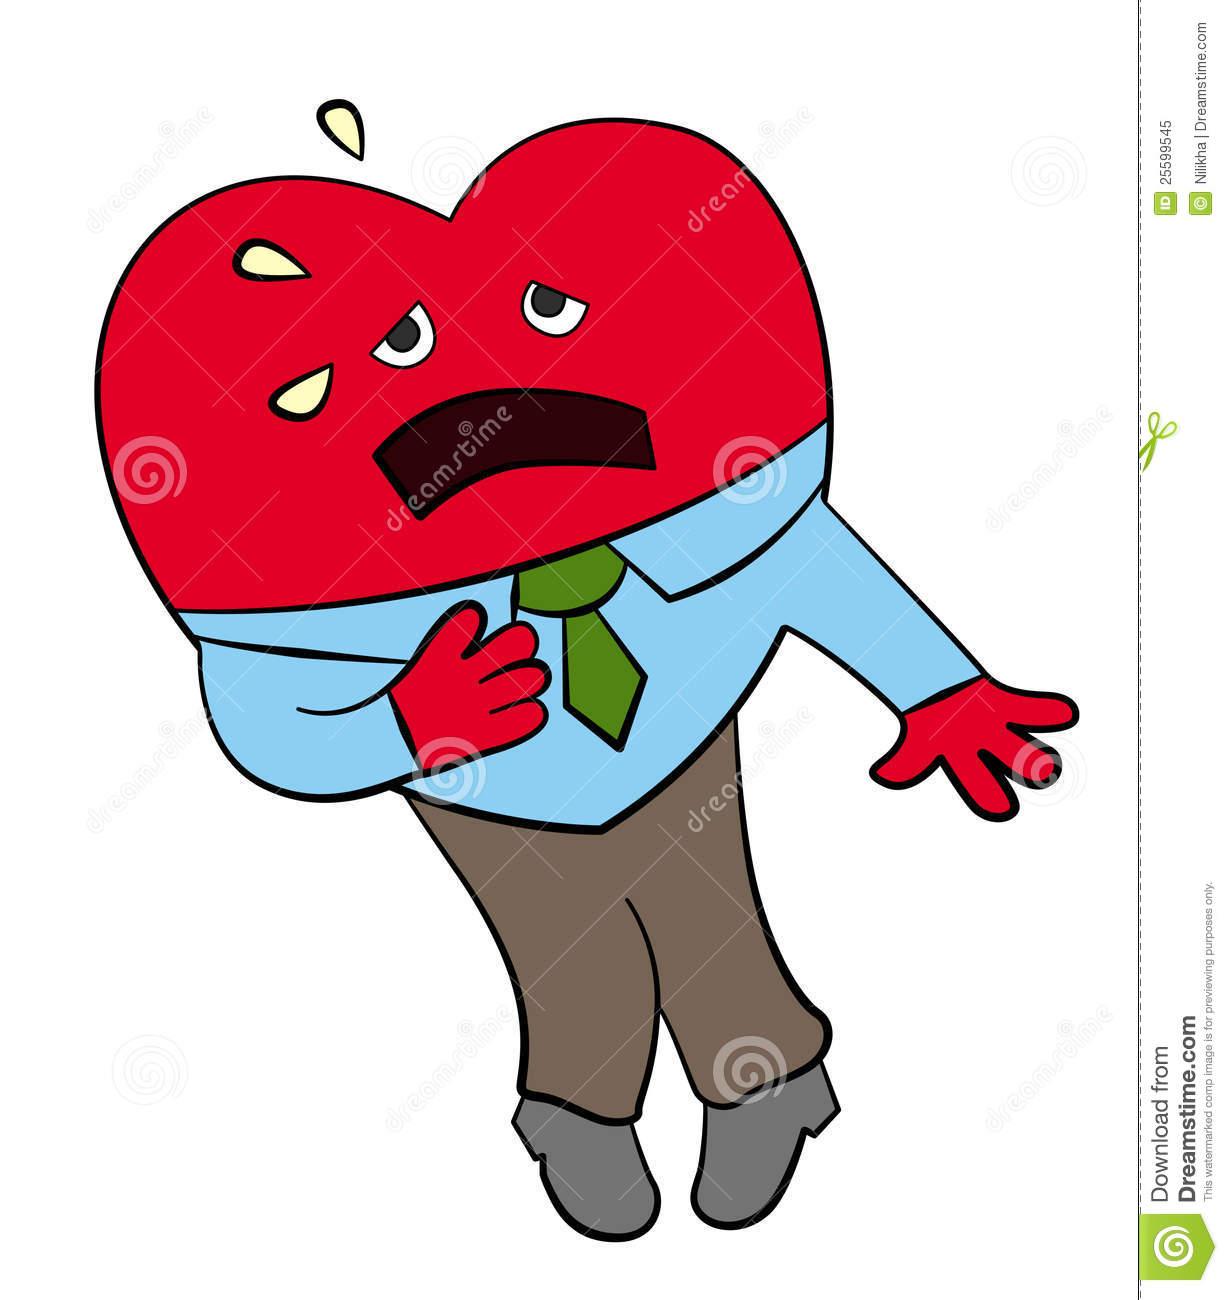 Cartoon Heart Dressed Like A Business Man Having A Heart Attack